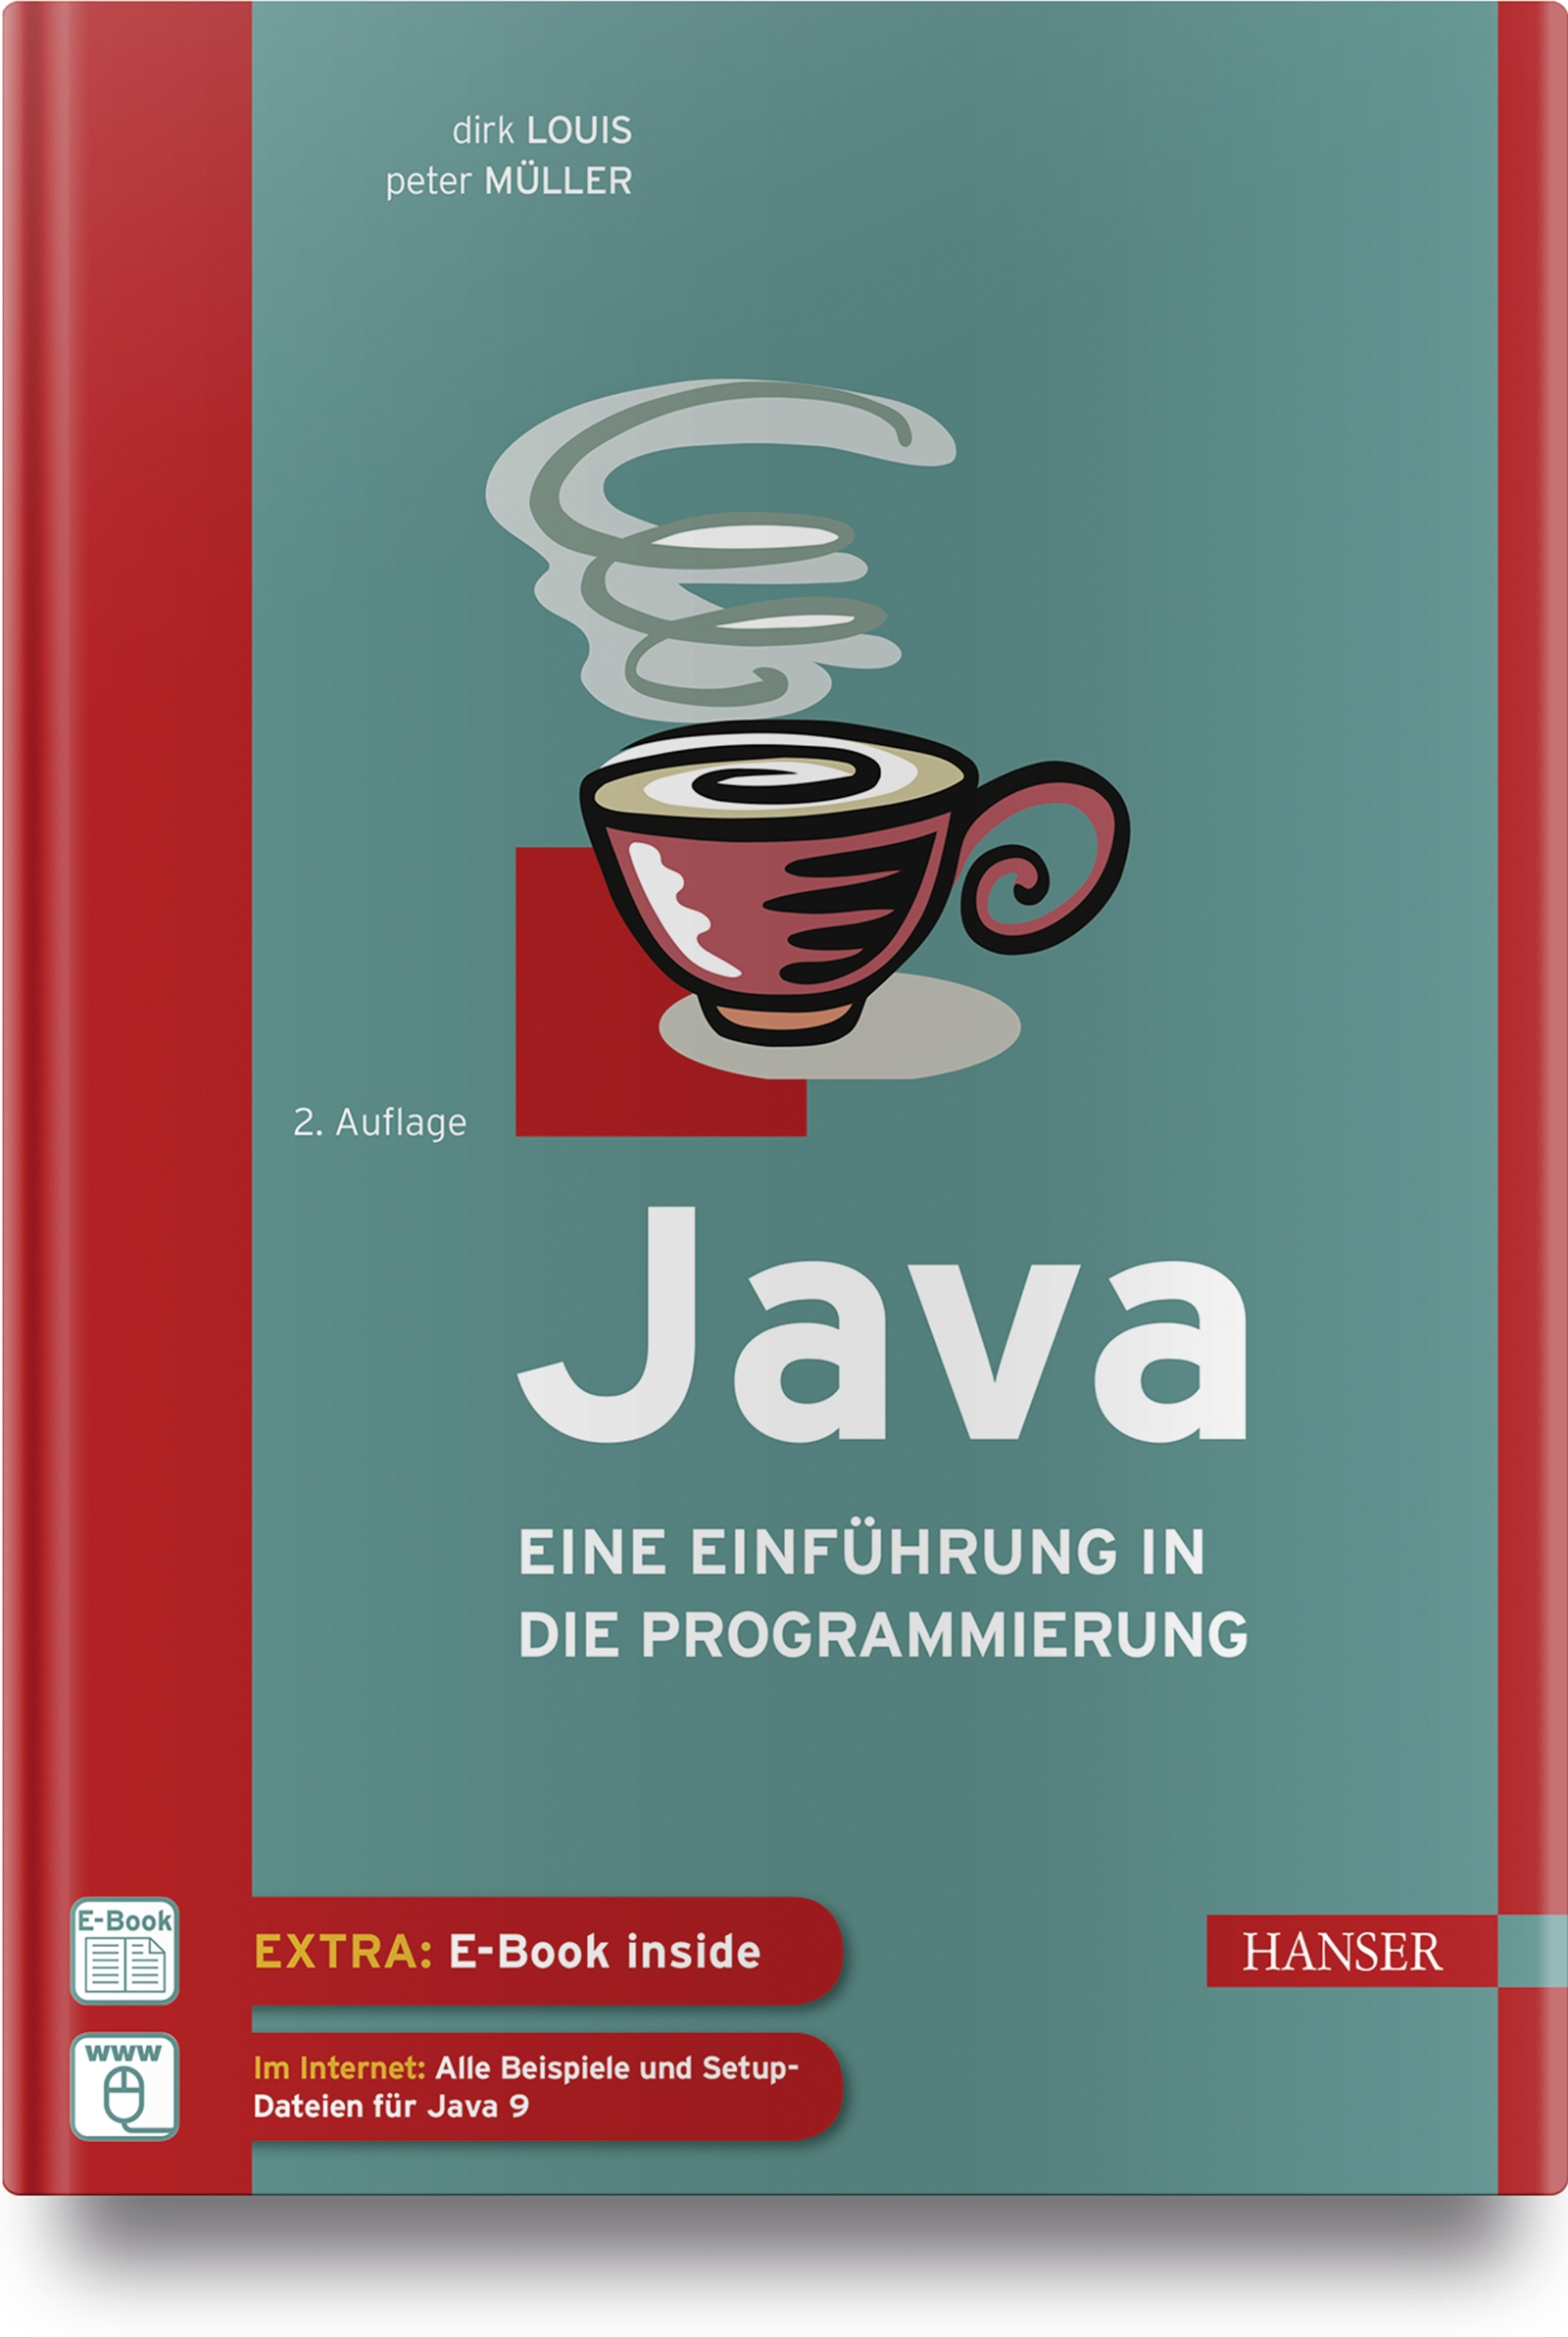 NEU-Java-Dirk-Louis-451940